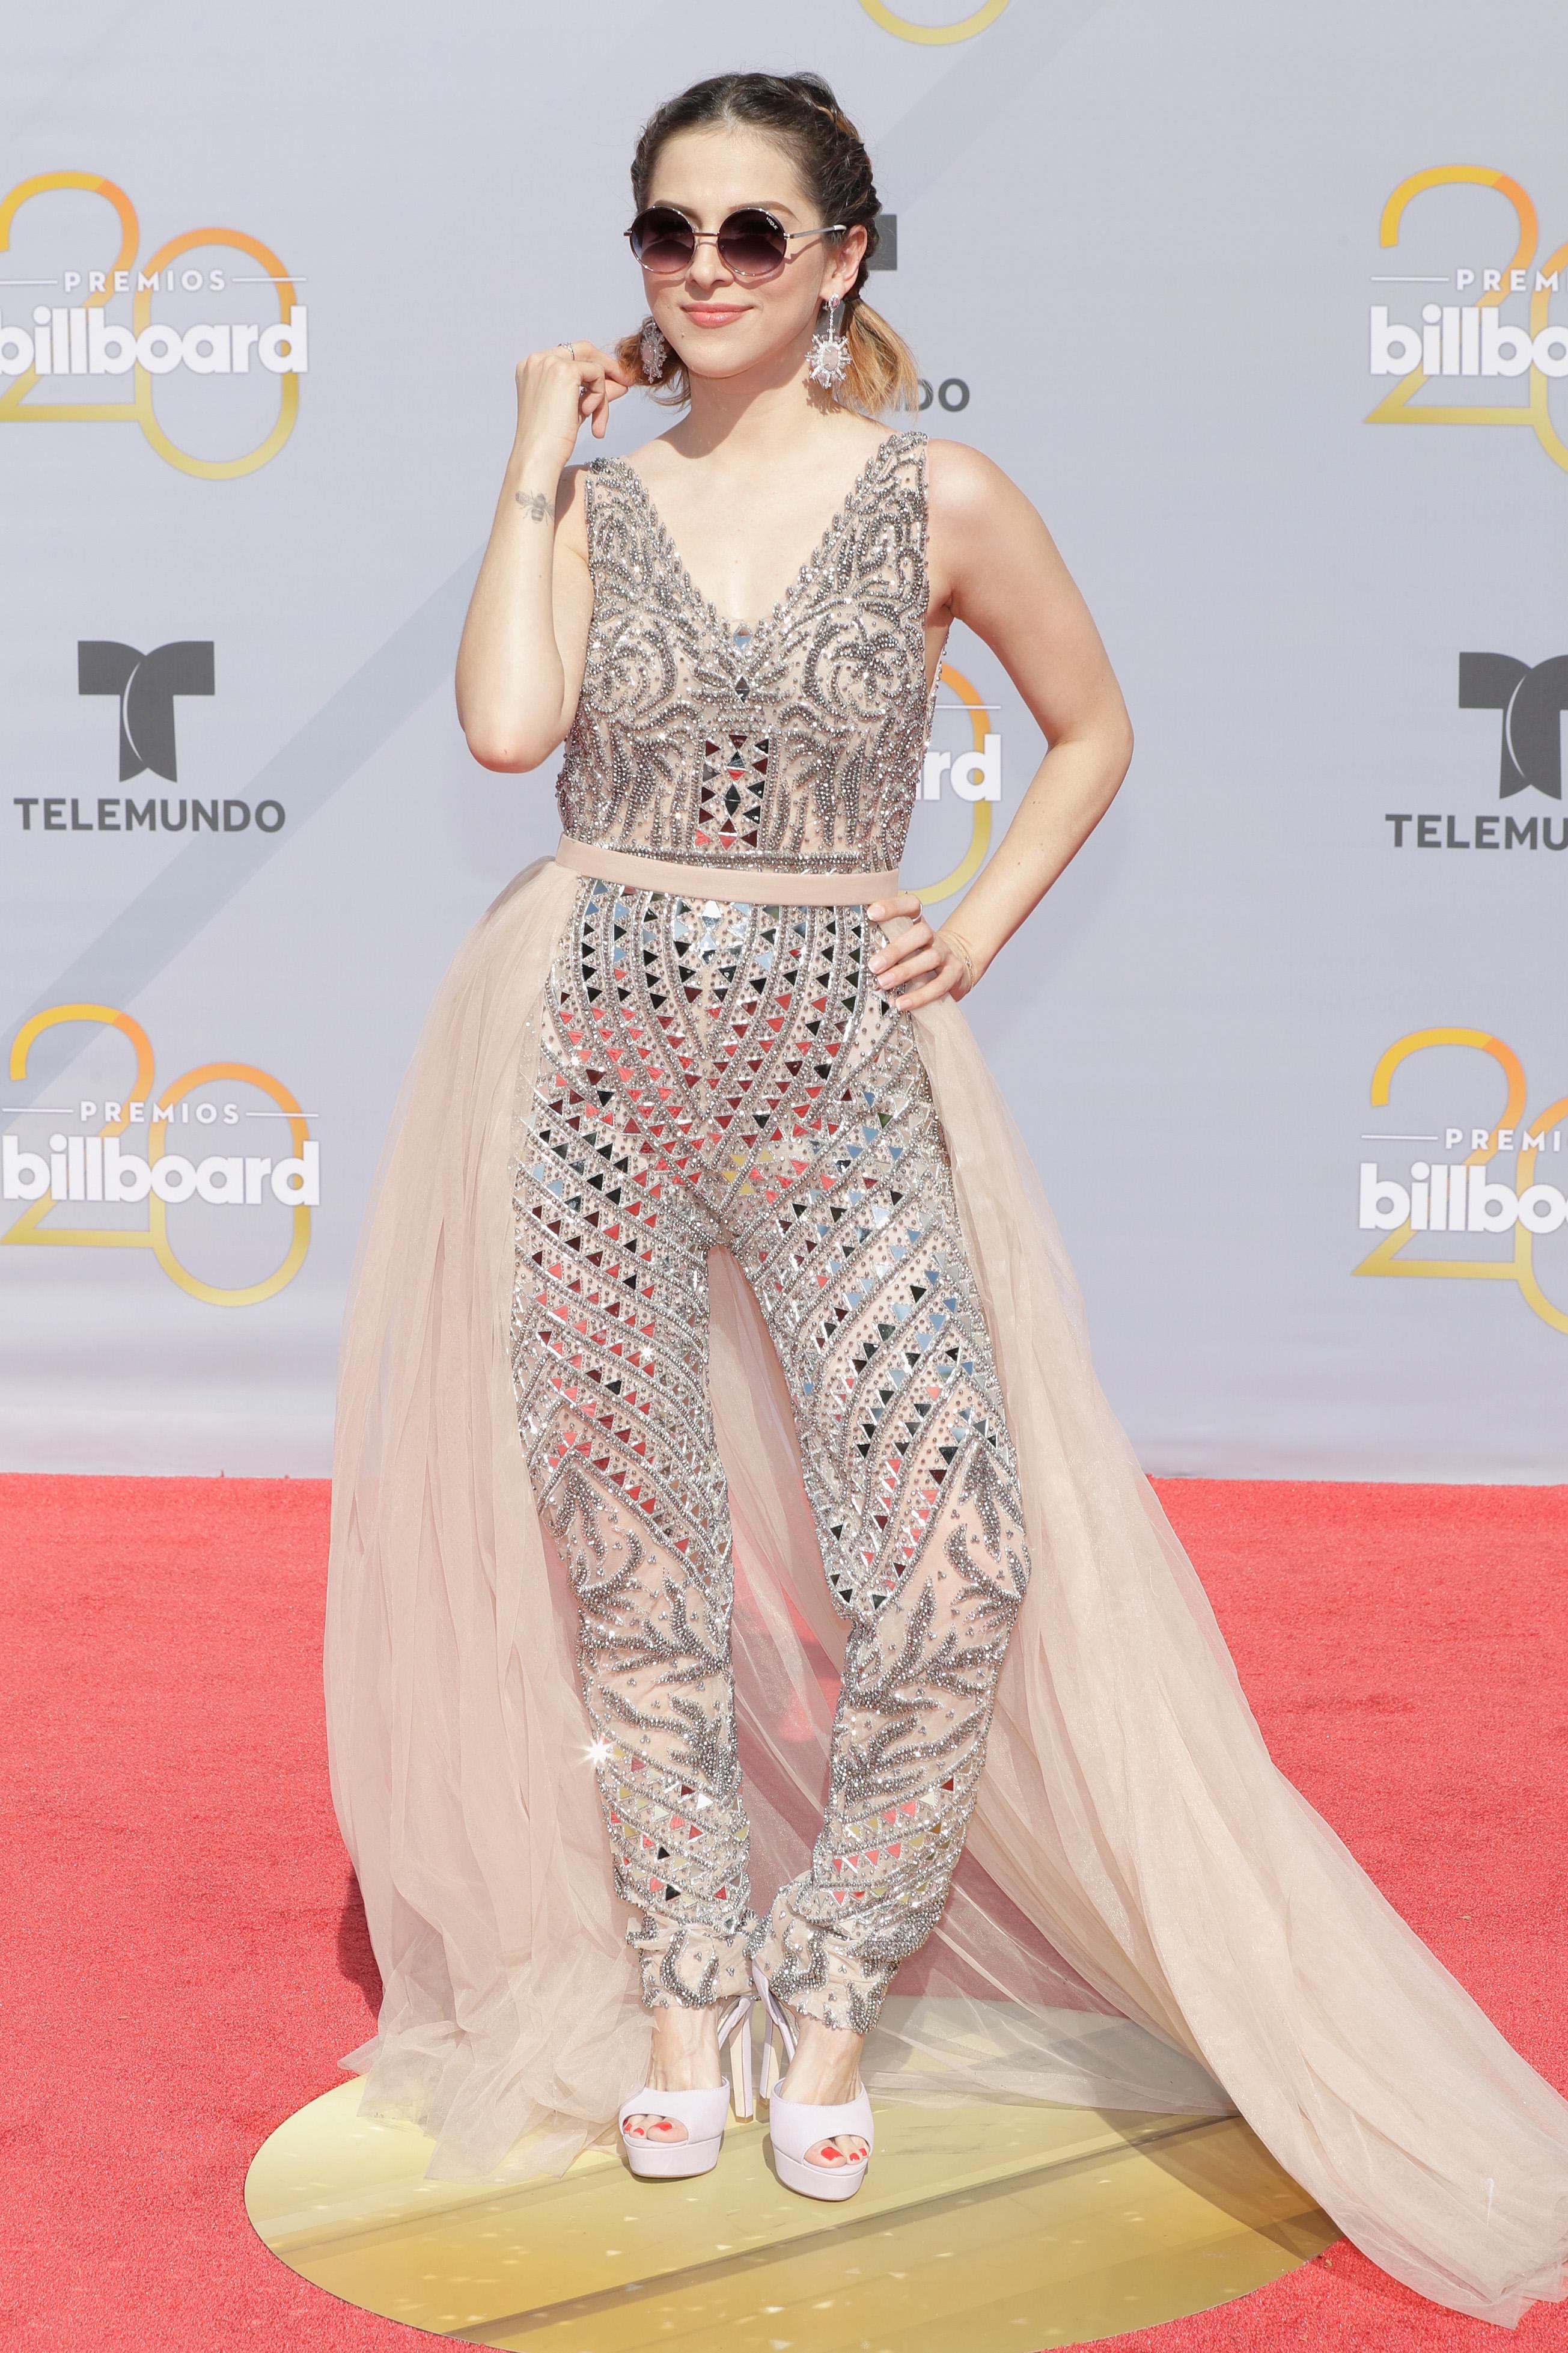 2018 Billboard Latin Music Awards - Arrivals